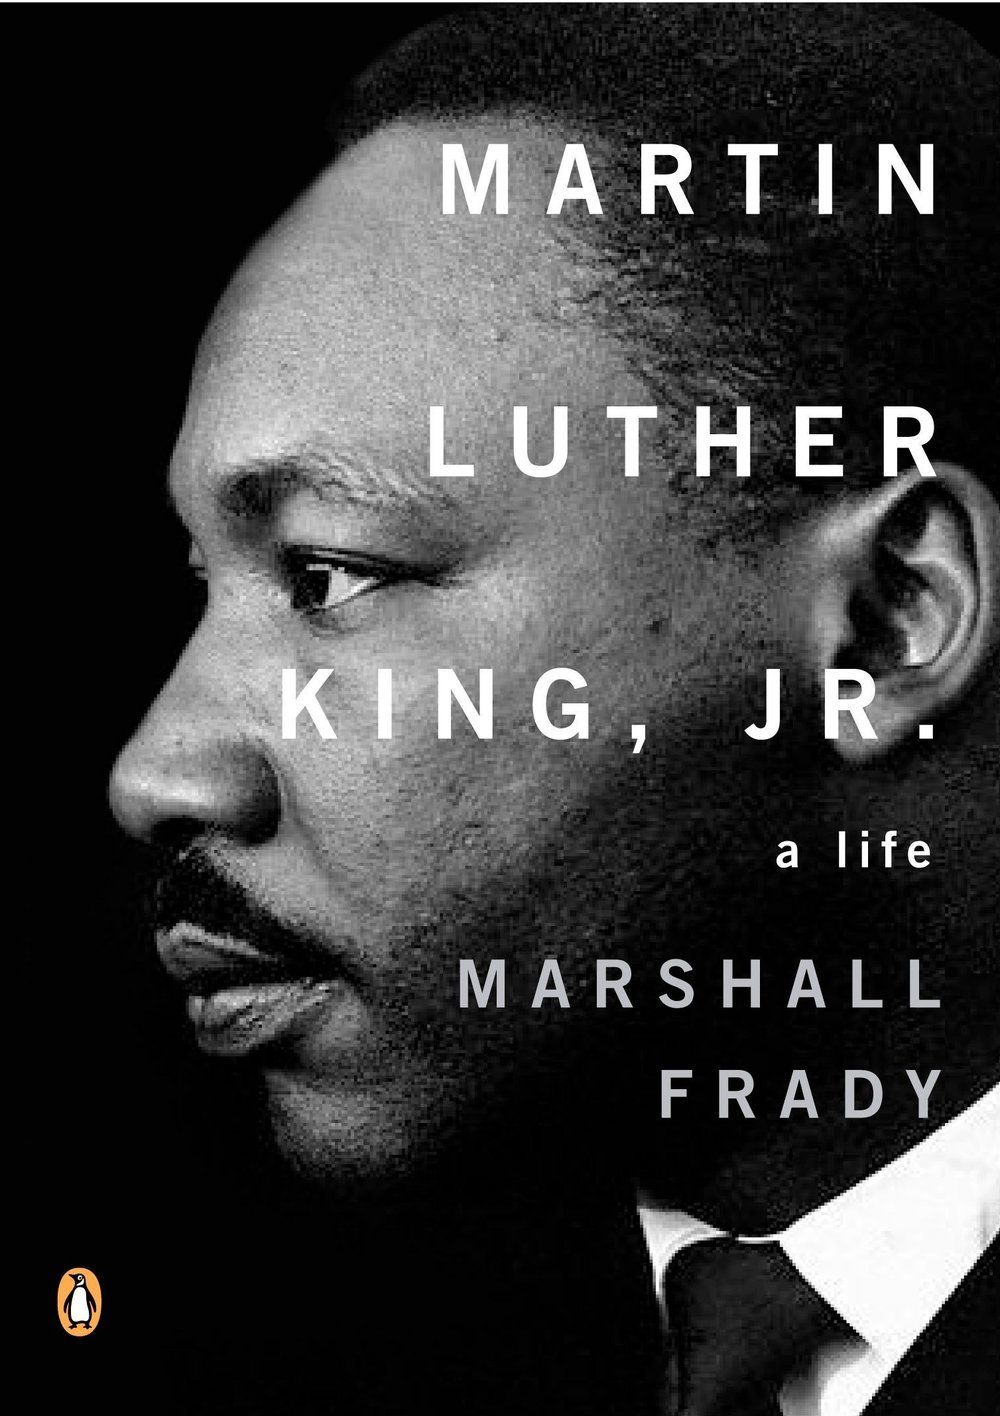 Martin Luther King Jr. Bookcover.jpg